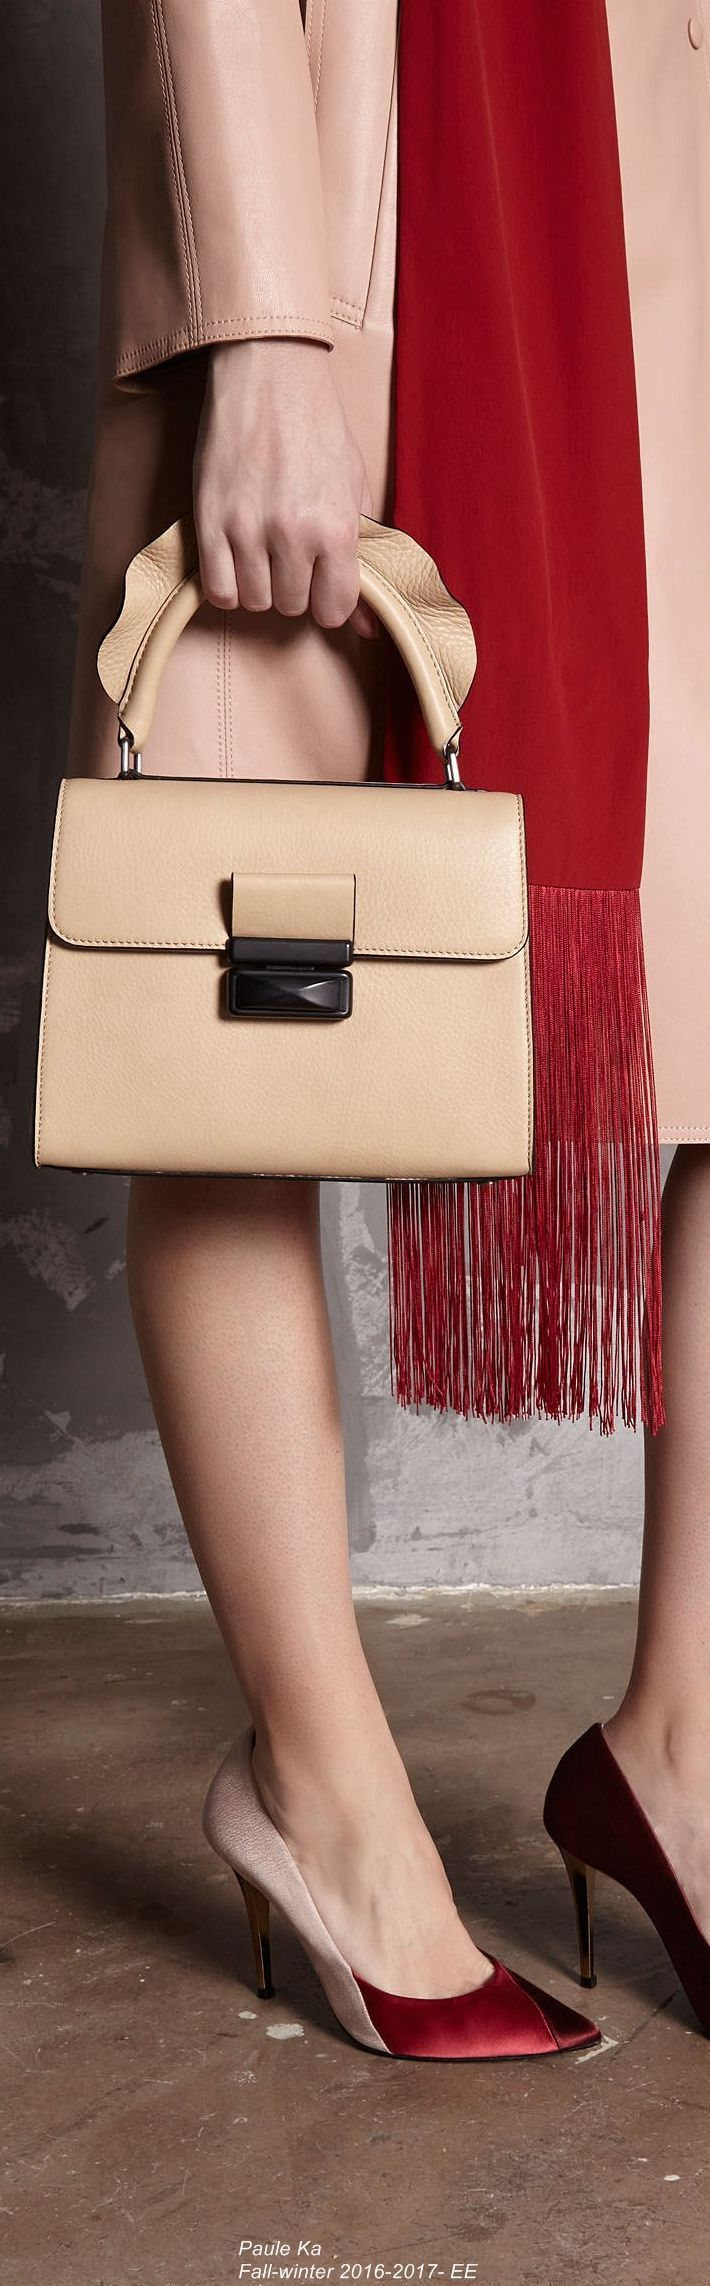 Paule Ka Fall-winter 2016-2017- EE - small zip around purse, buy ladies handbags online, leather coin purse *ad